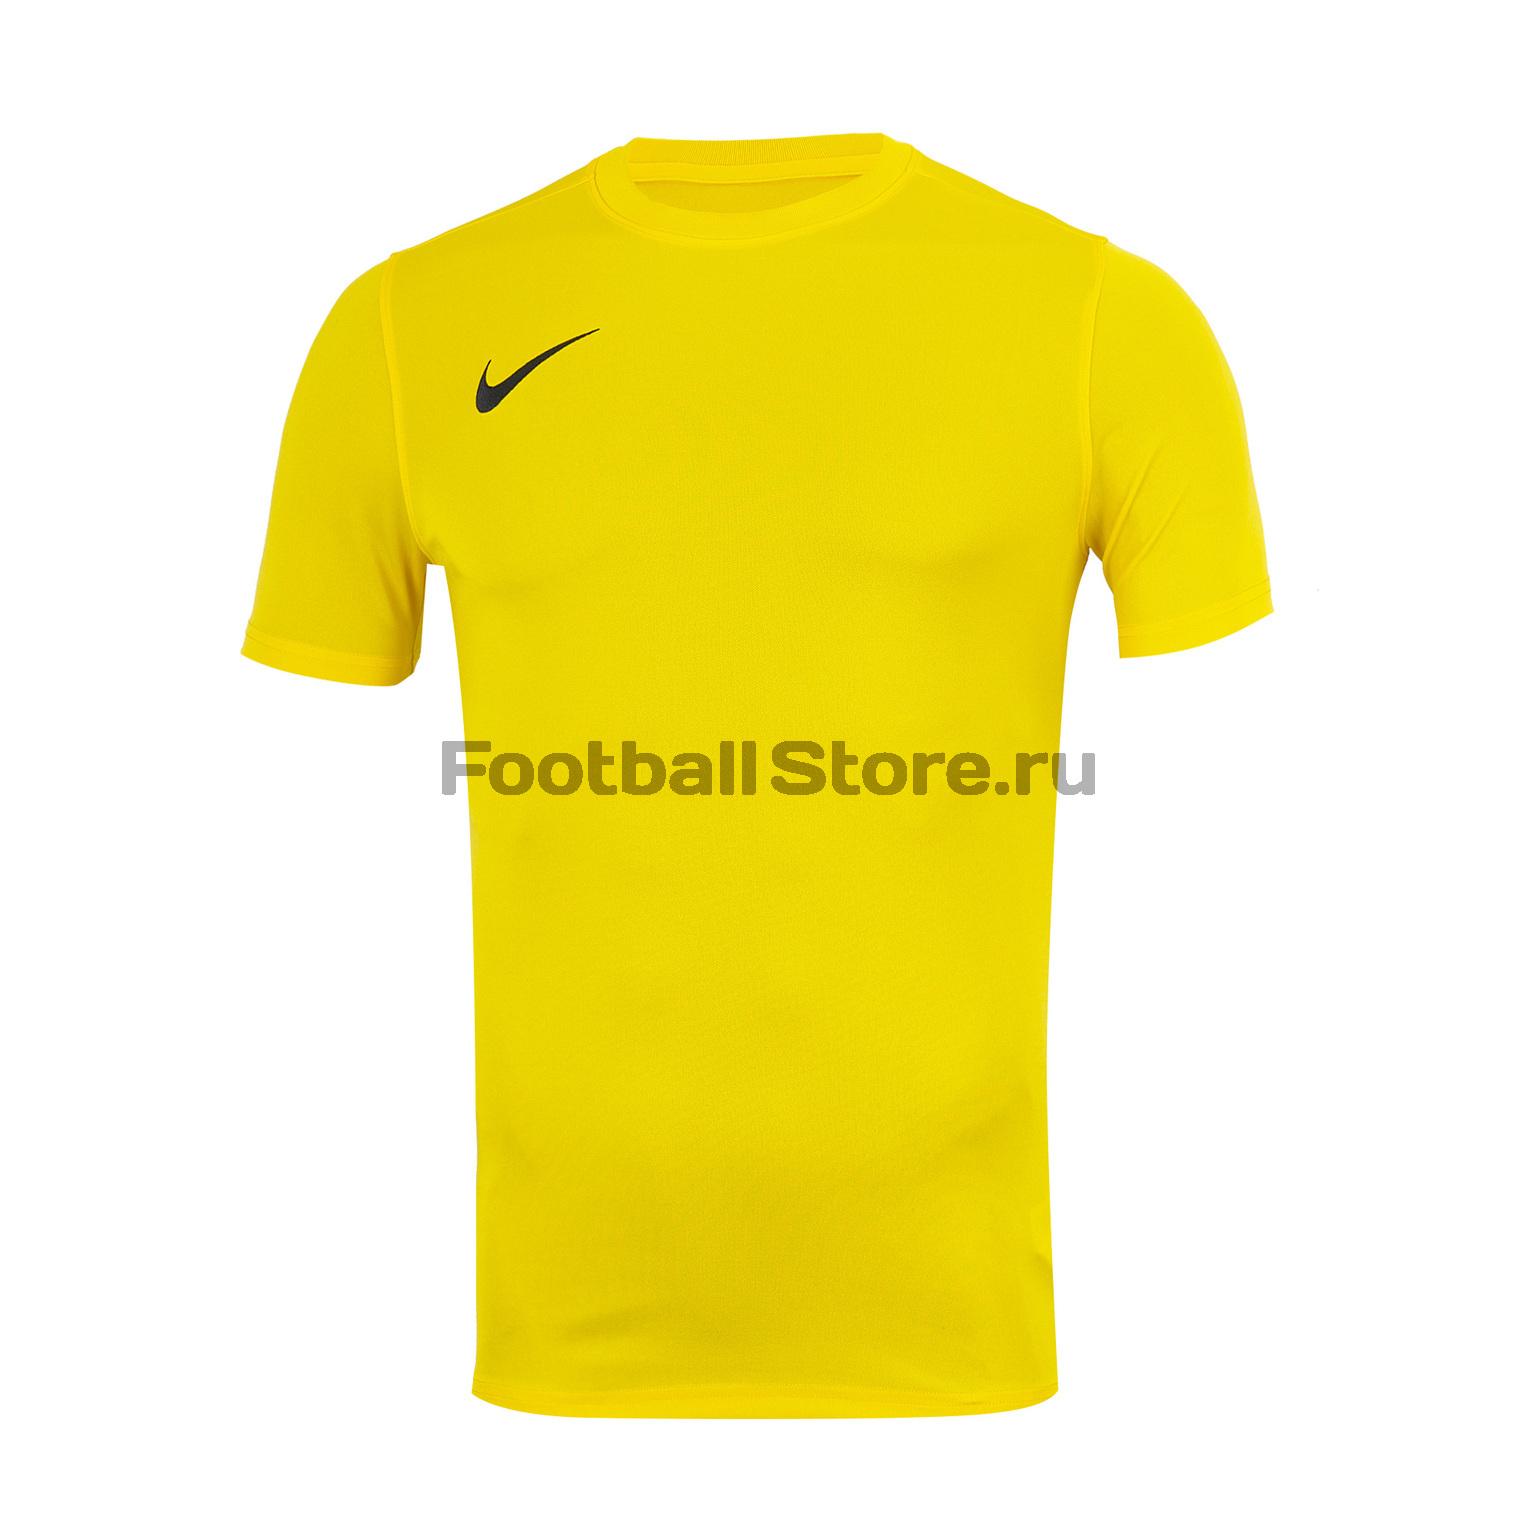 Футболка игровая Nike Dry Park VII BV6708-719 цена и фото